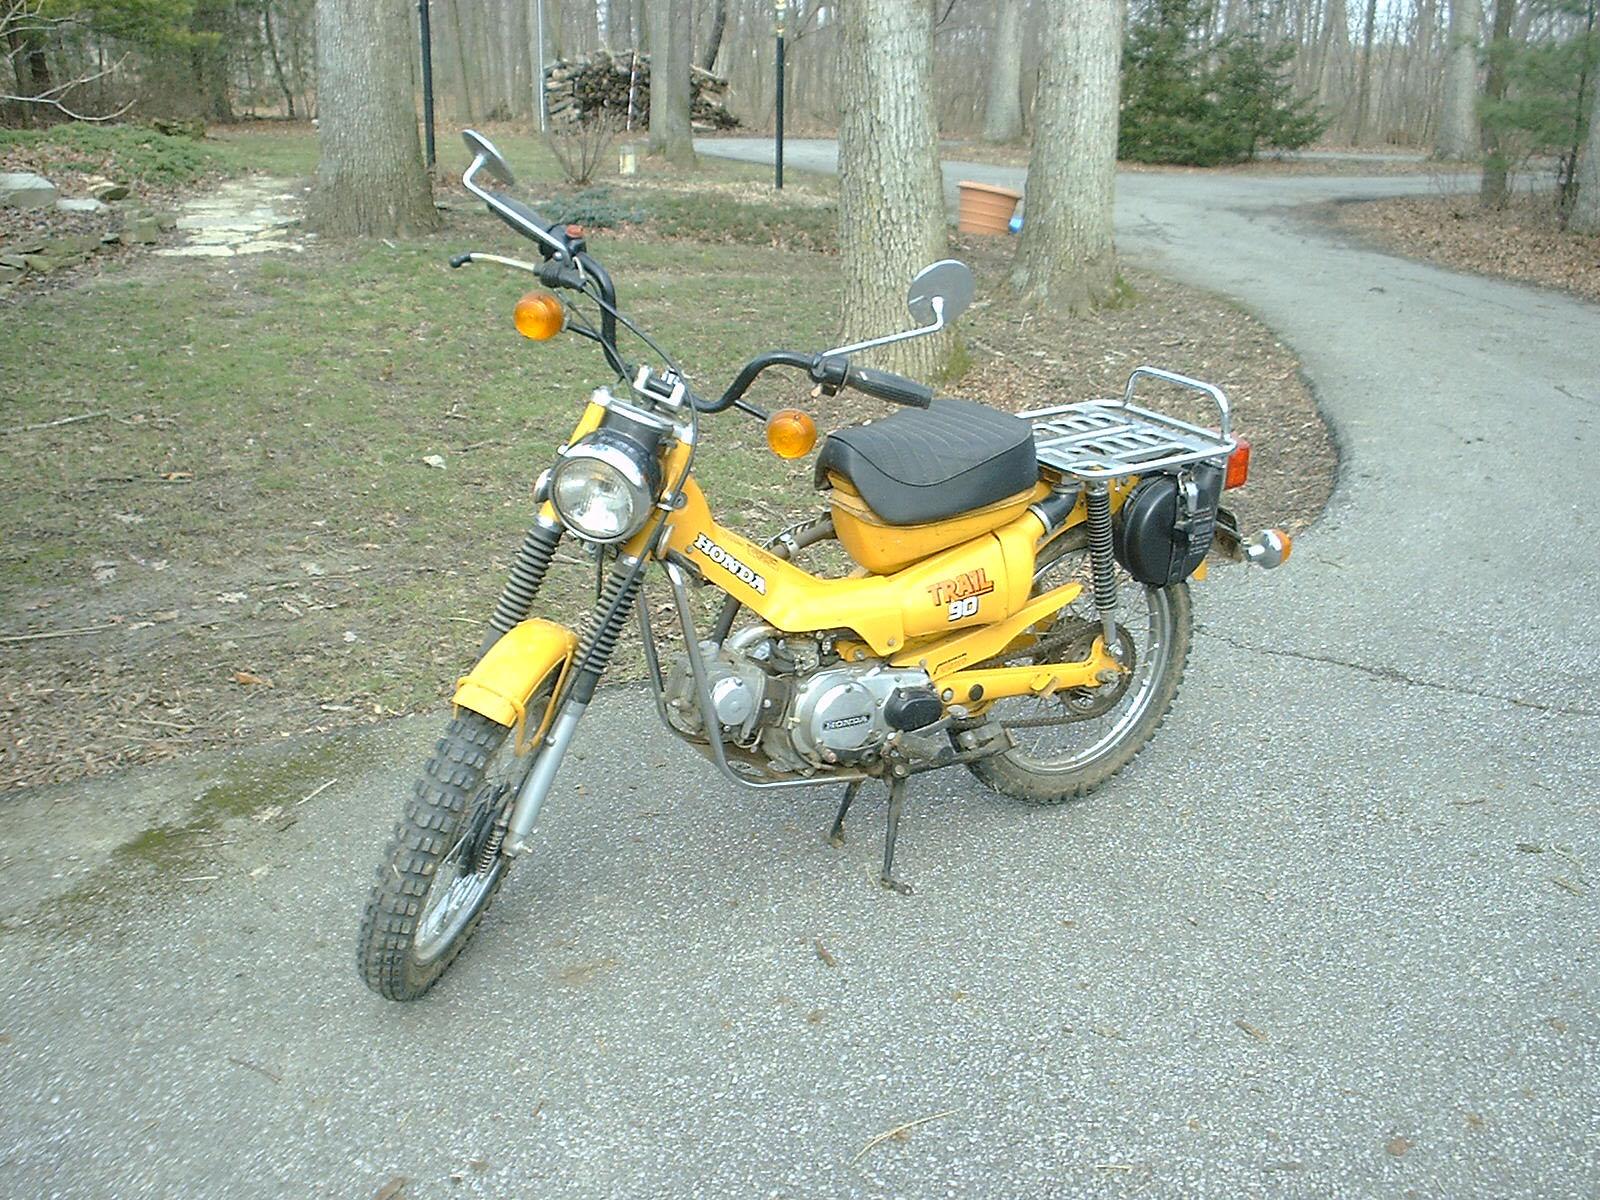 Click image for larger version  Name:bike 3.jpg Views:8266 Size:530.2 KB ID:6498